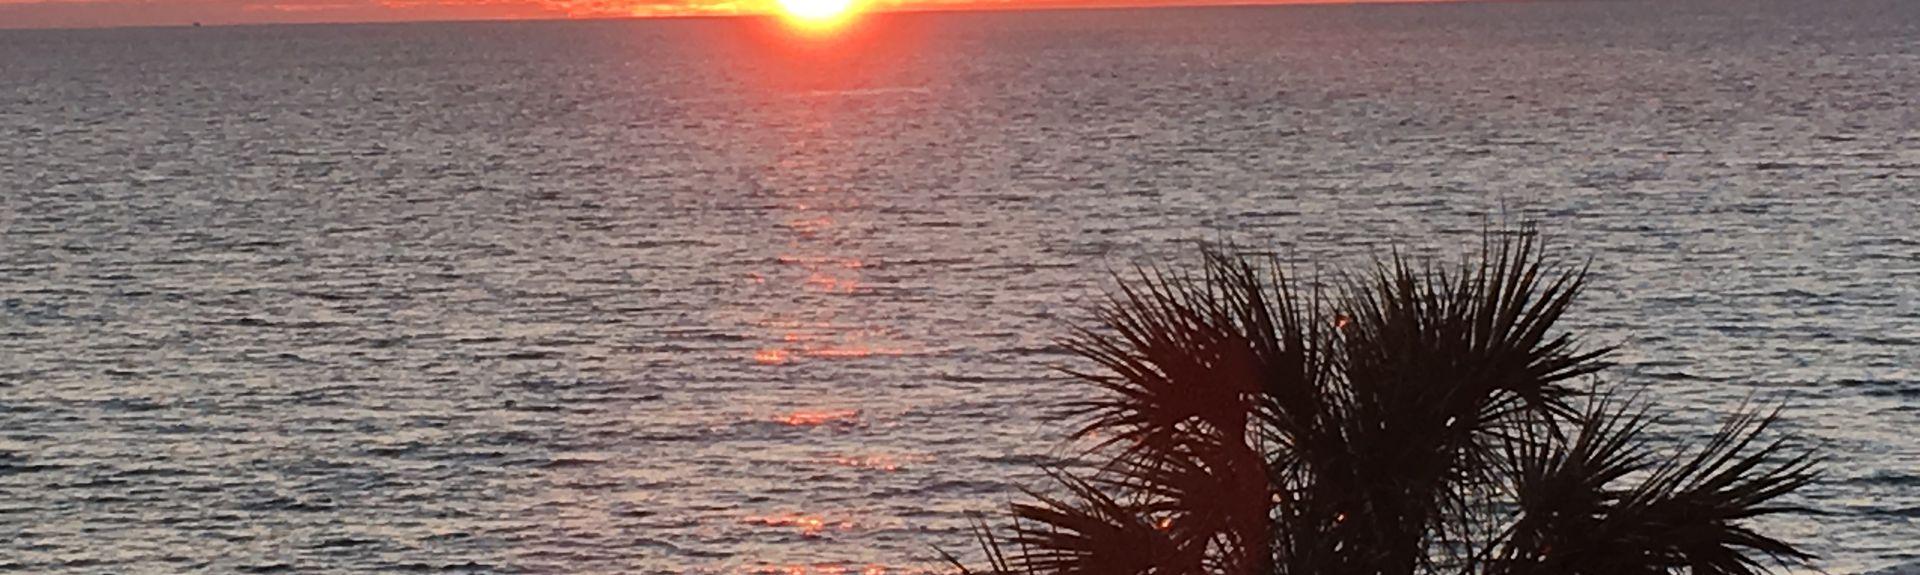 Gulf Crest Condominiums, Panama City Beach, FL, USA